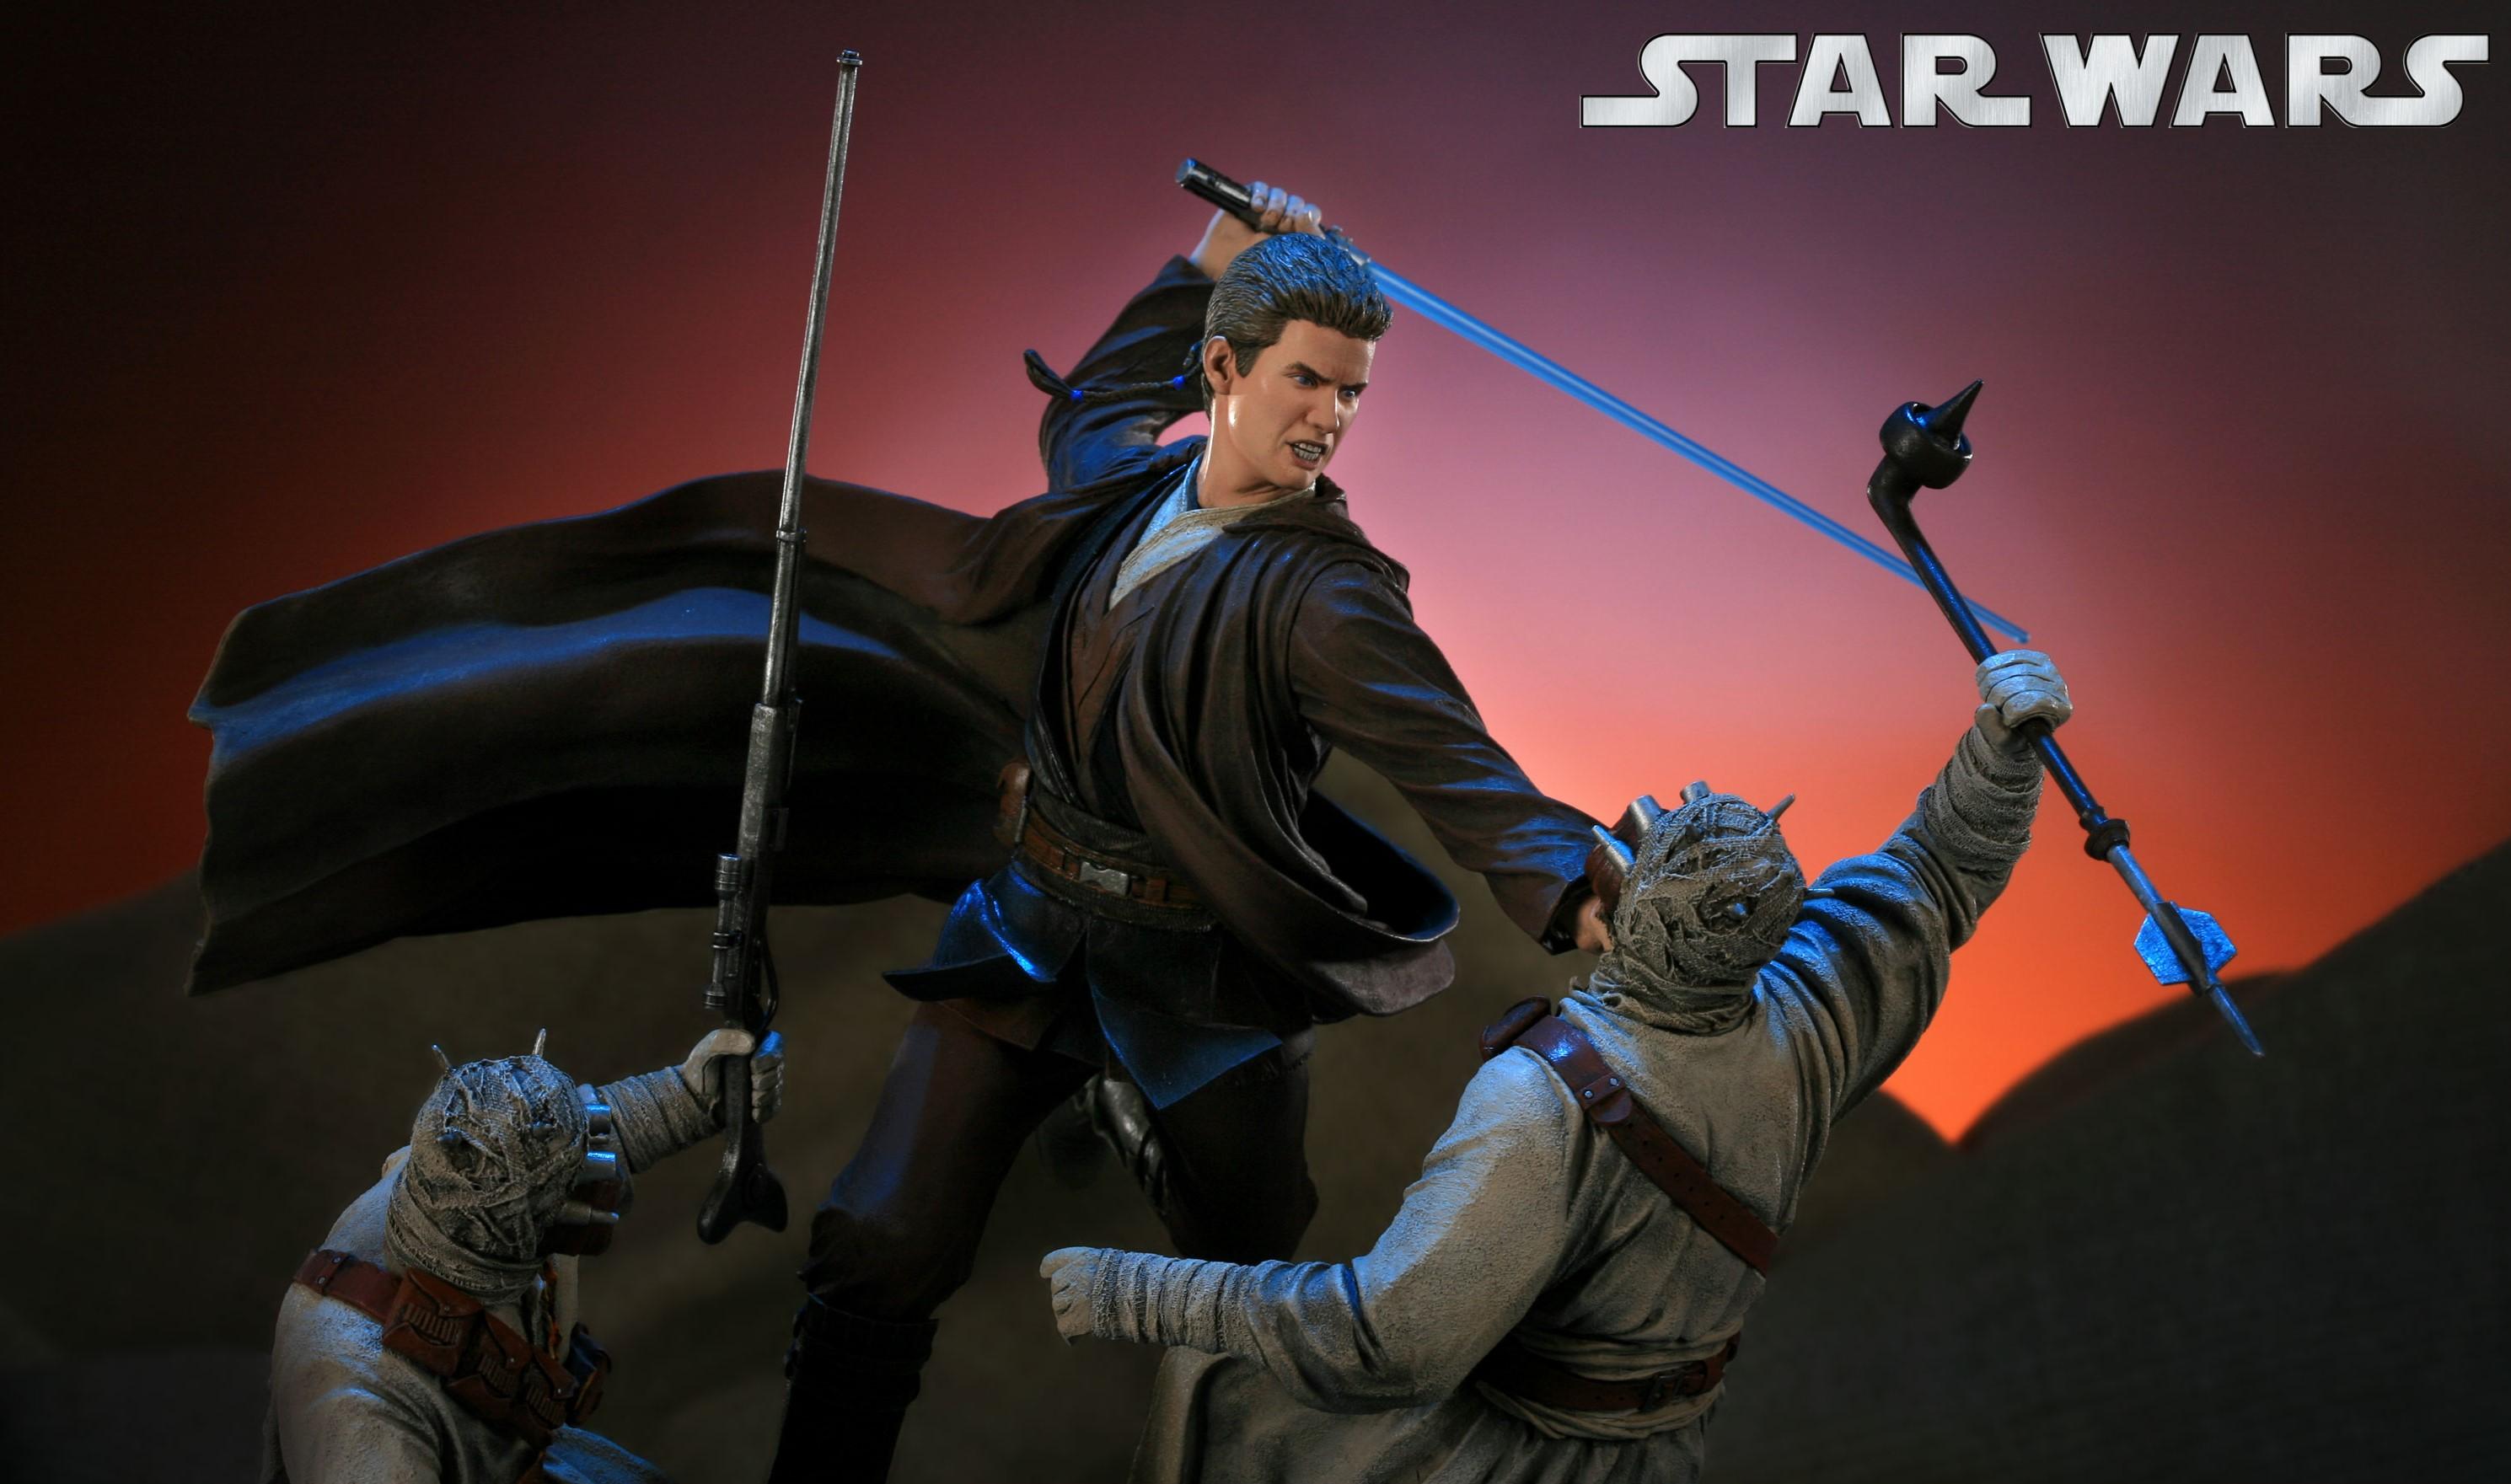 Star Wars Episode Ii Attack Of The Clones Hd Wallpaper